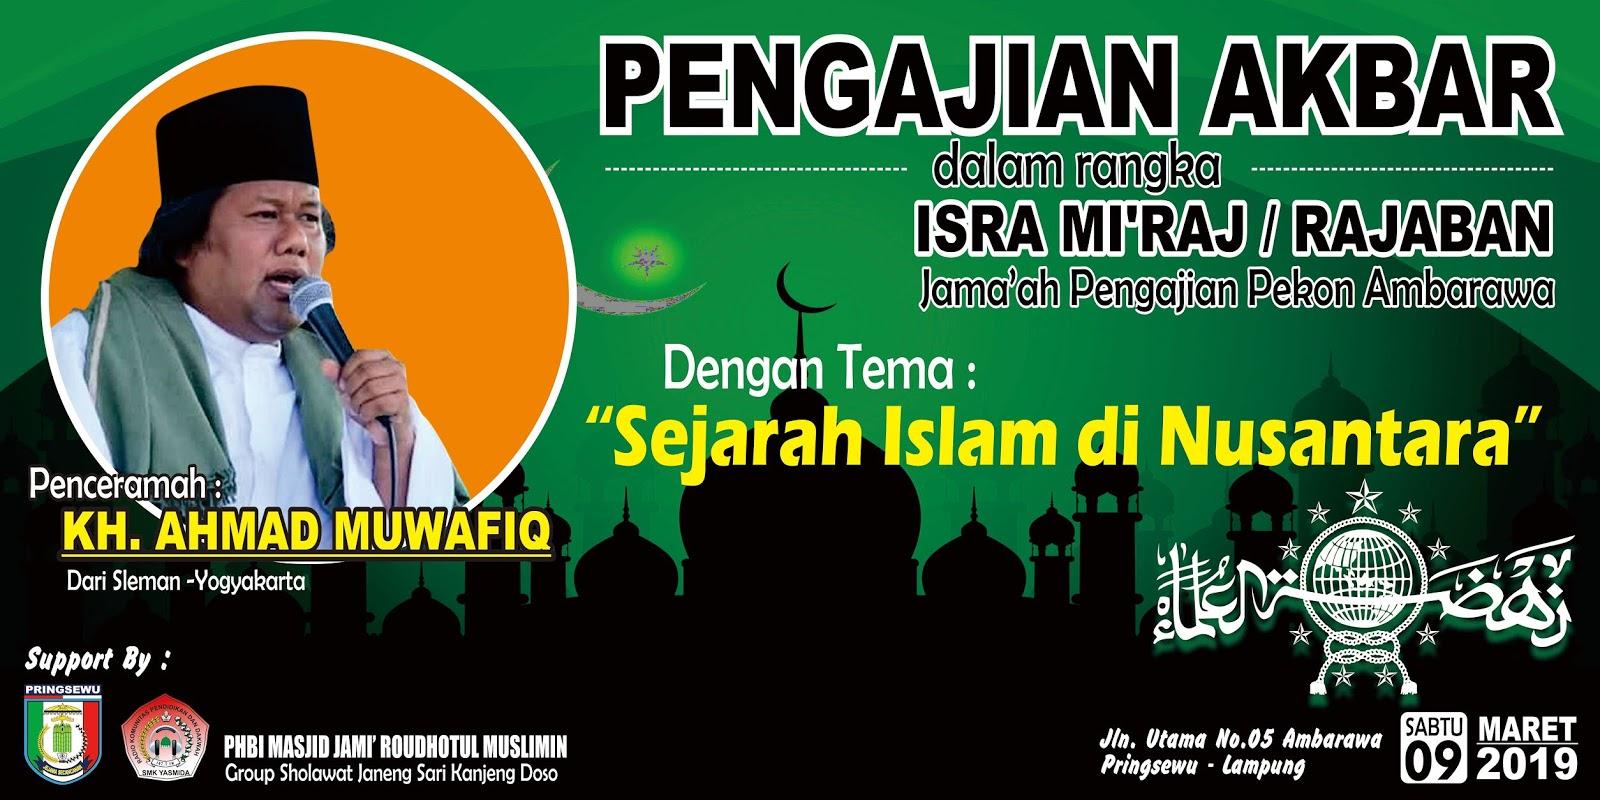 Desain Banner Pengajian Akbar Isra Miraj cdr